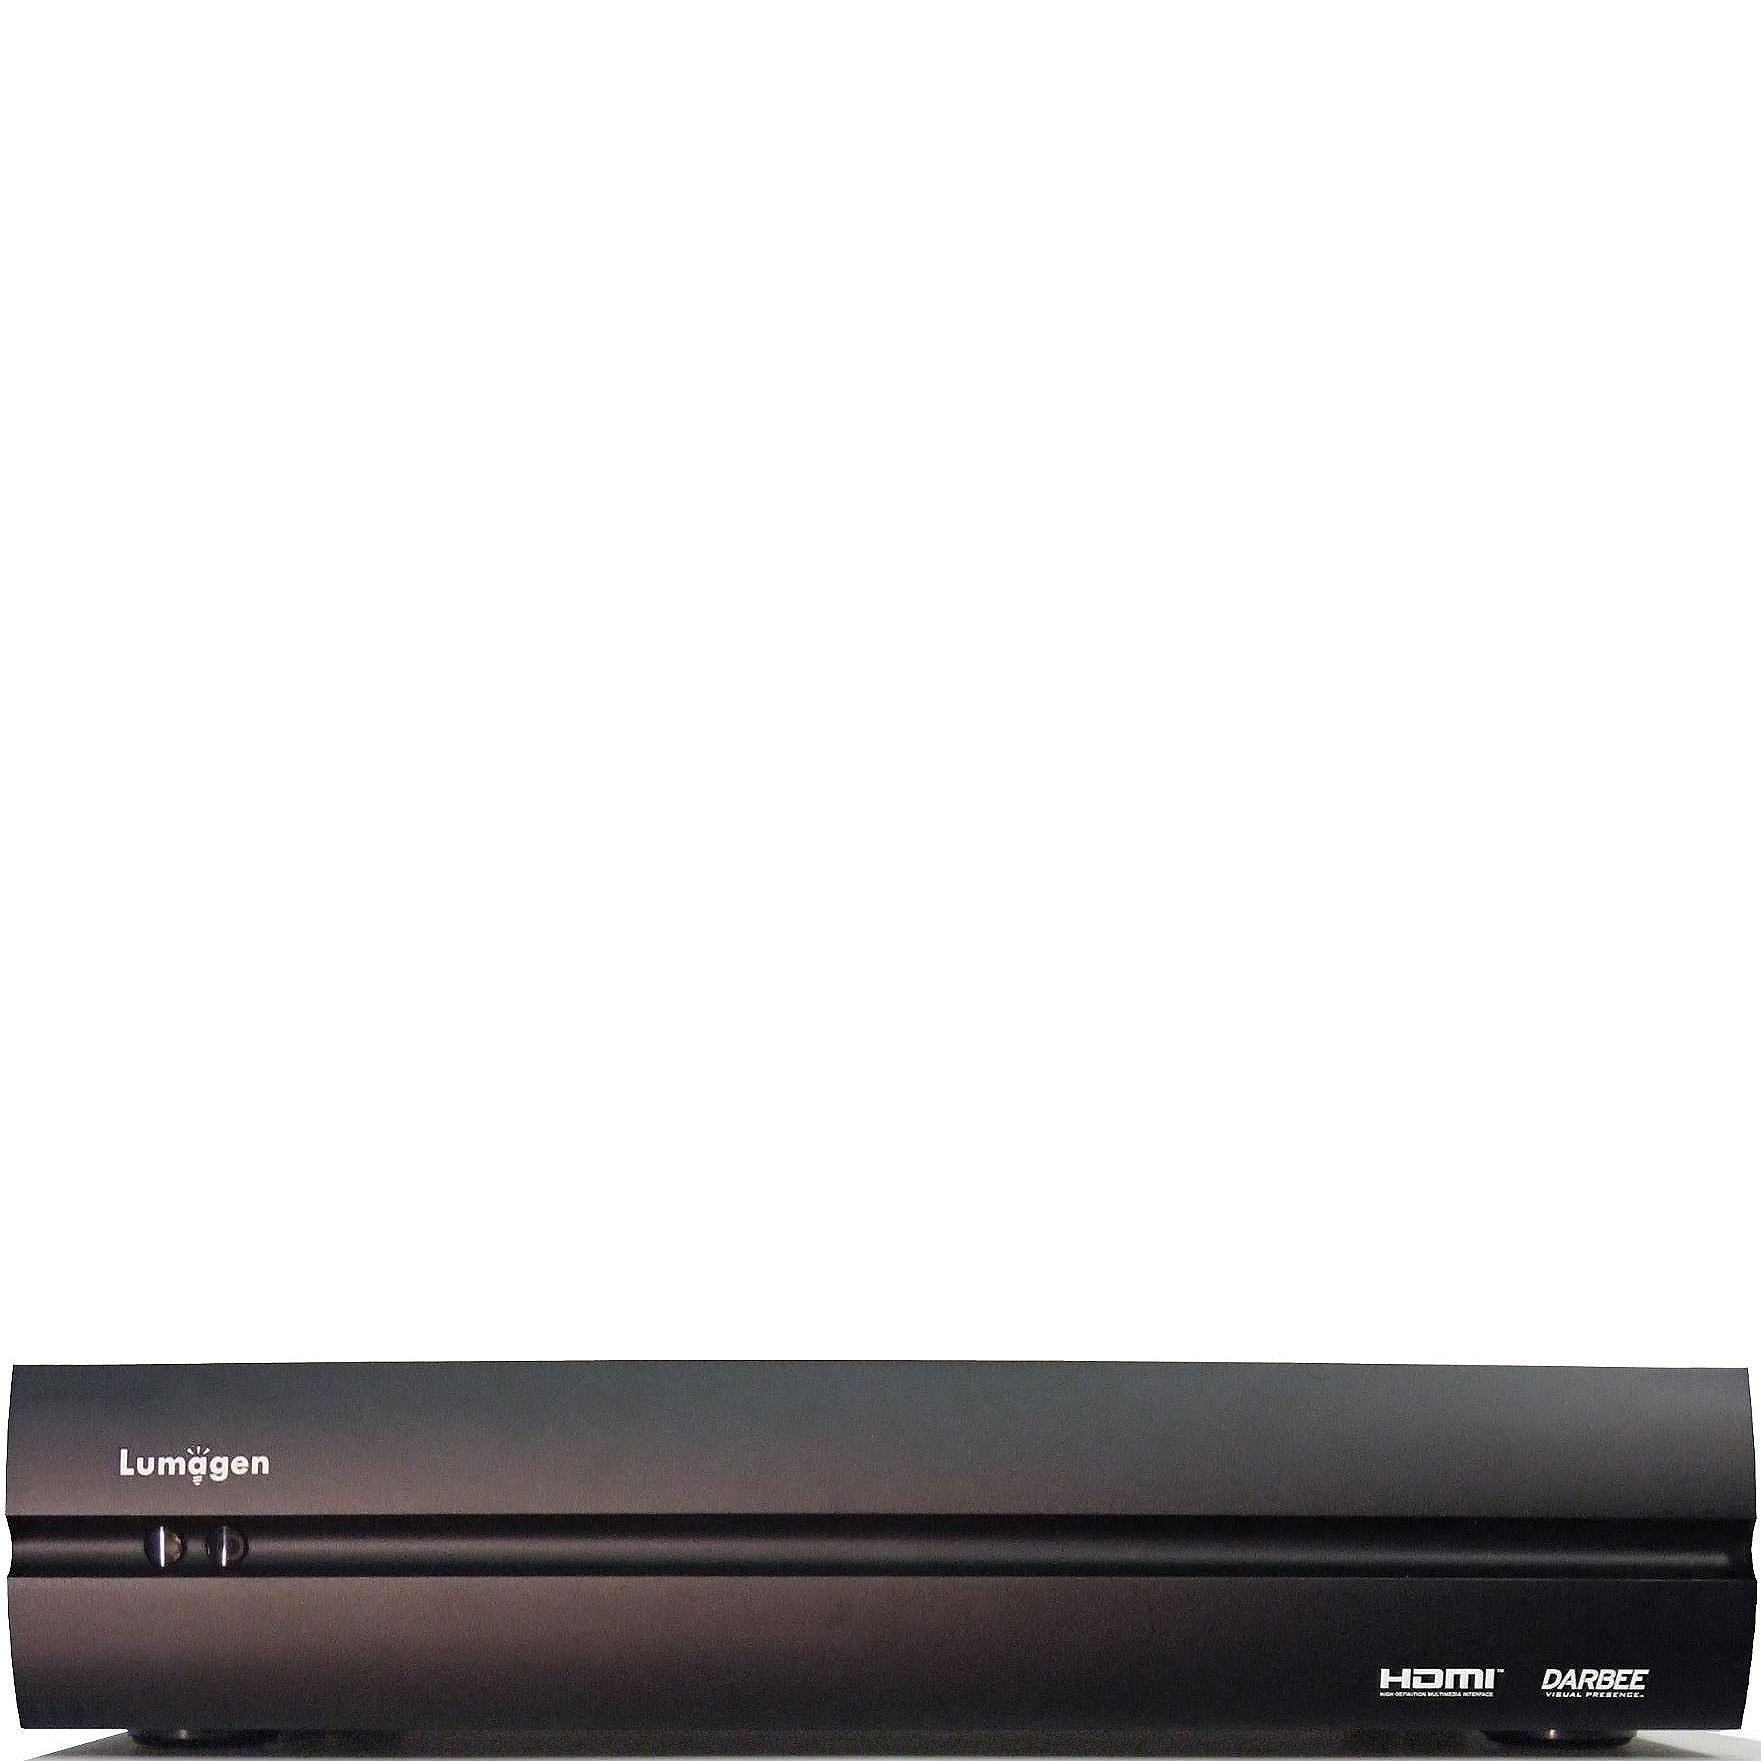 Lumagen Radiance 2123 Series Video Processor